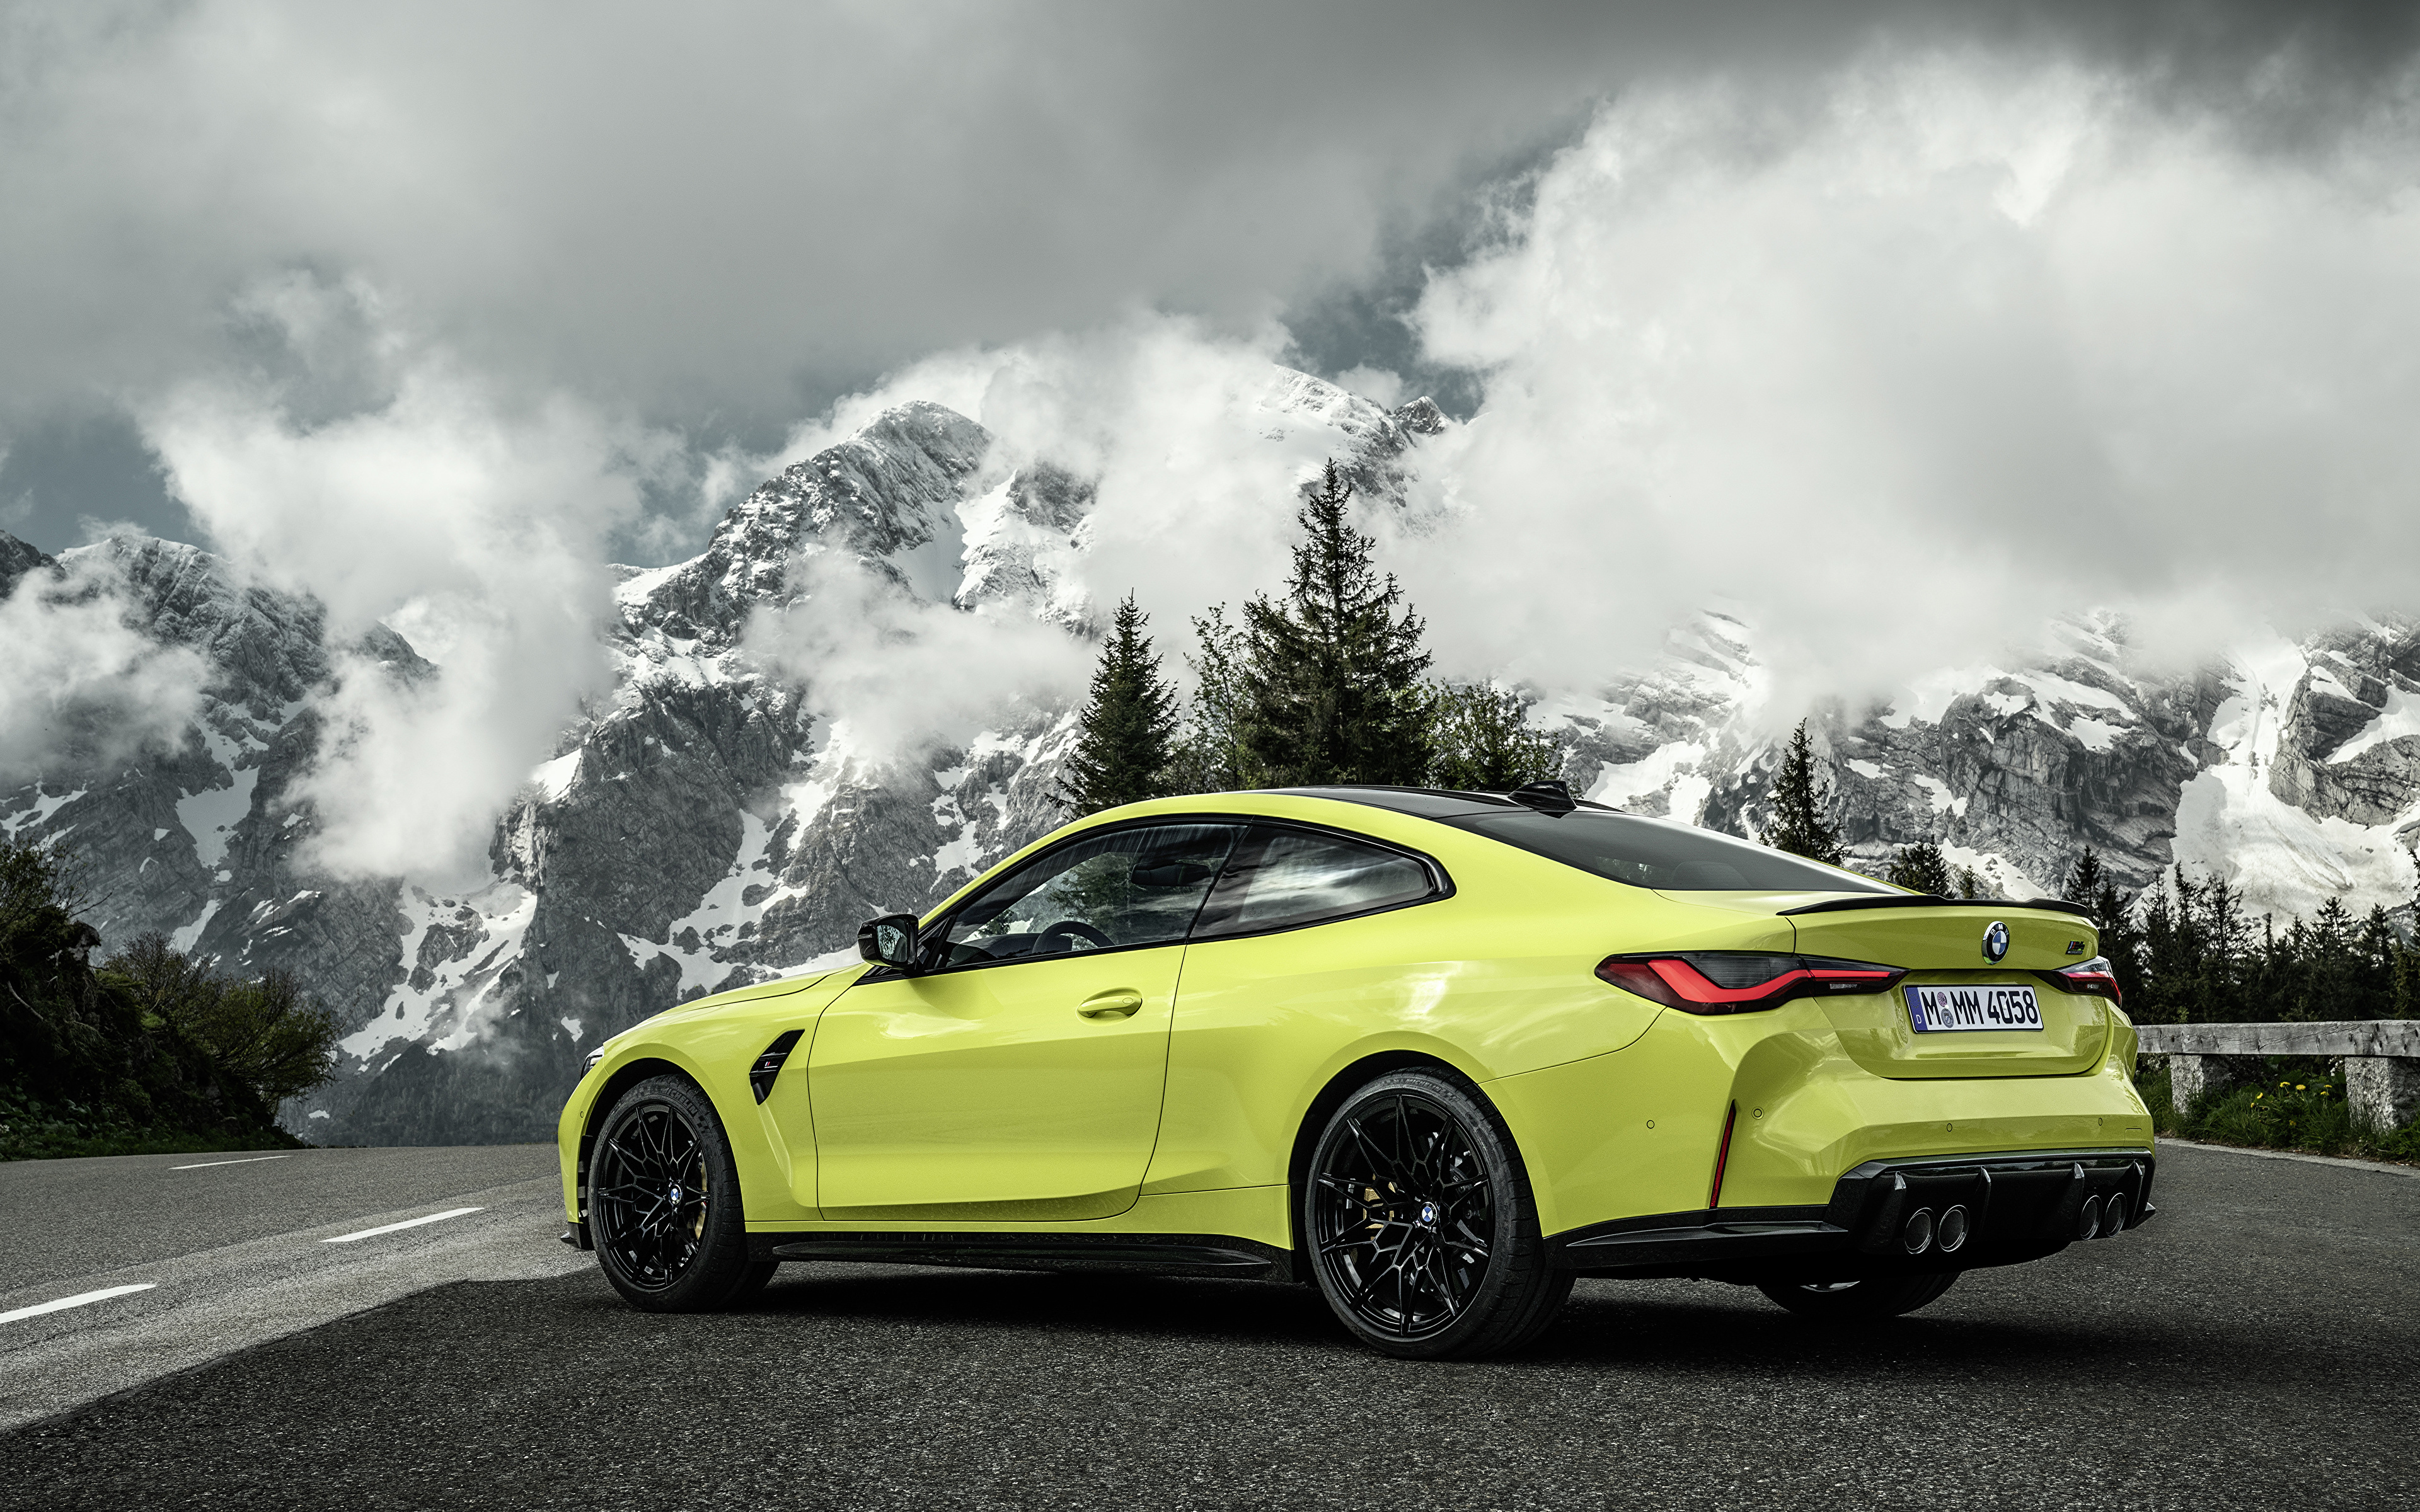 Картинки БМВ M4 Competition, (G82), 2020 Купе гора Природа Металлик автомобиль облачно 3840x2400 BMW Горы авто машины машина Автомобили Облака облако